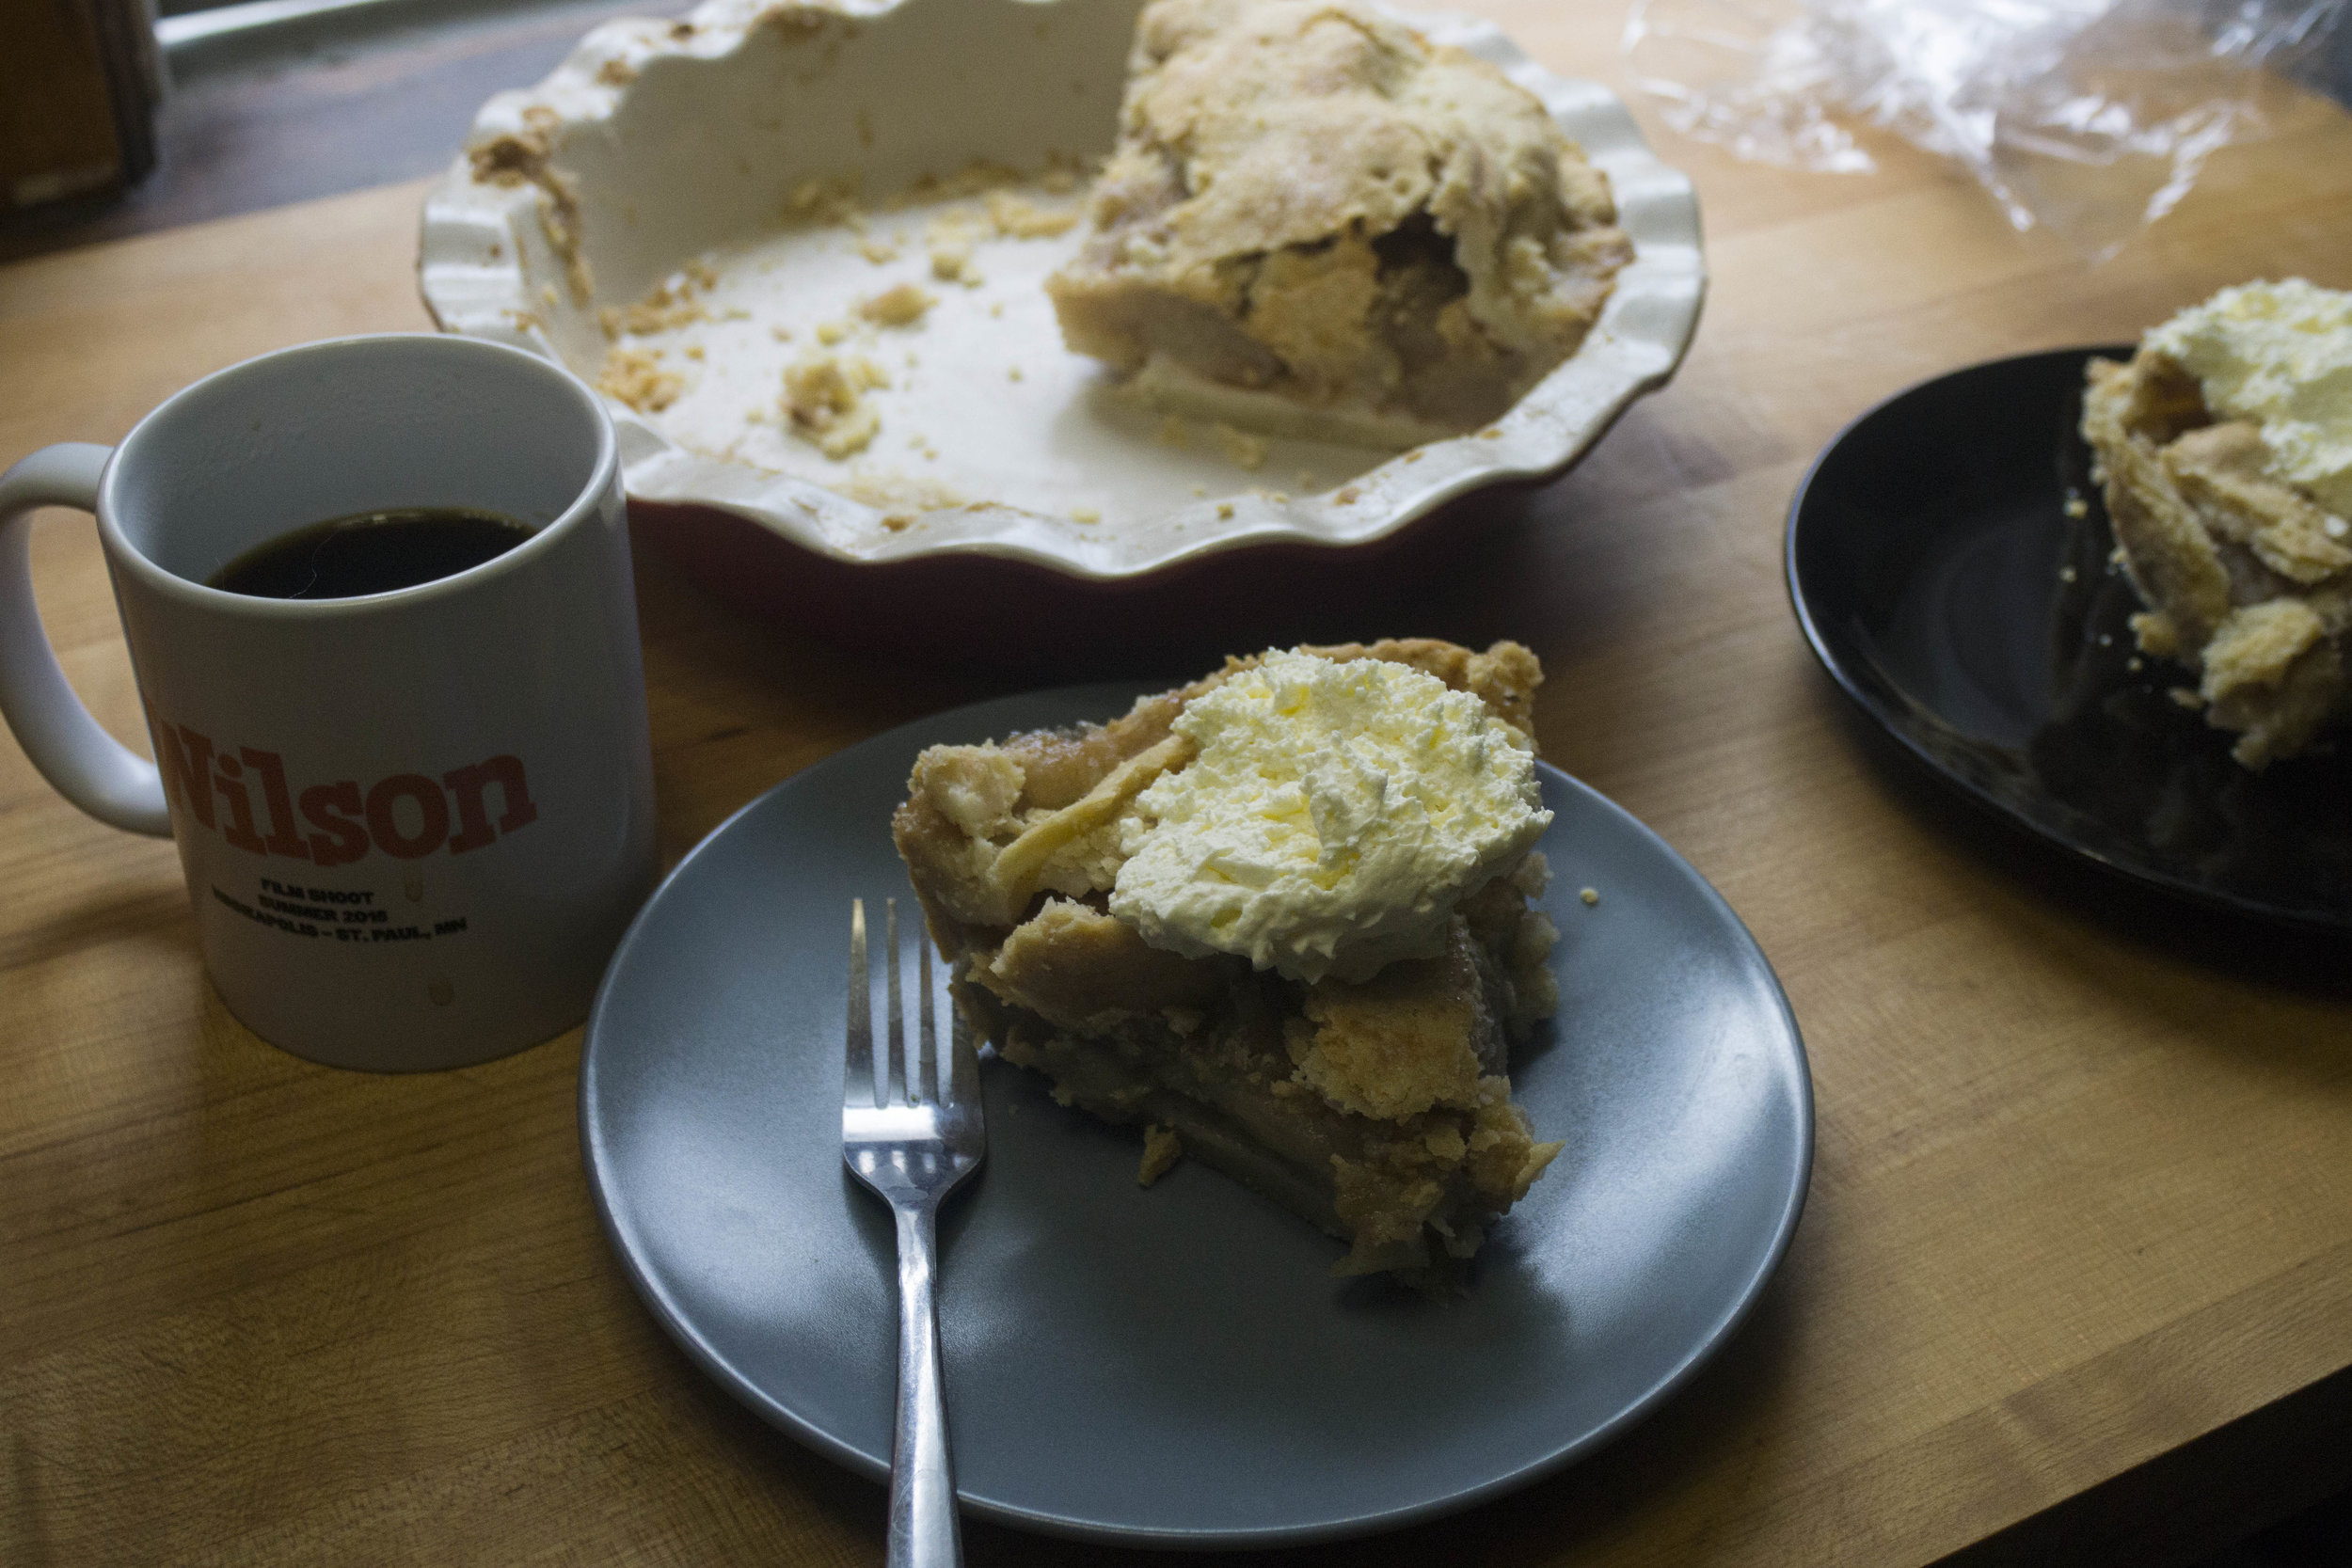 Apple pie = best lunch ever.